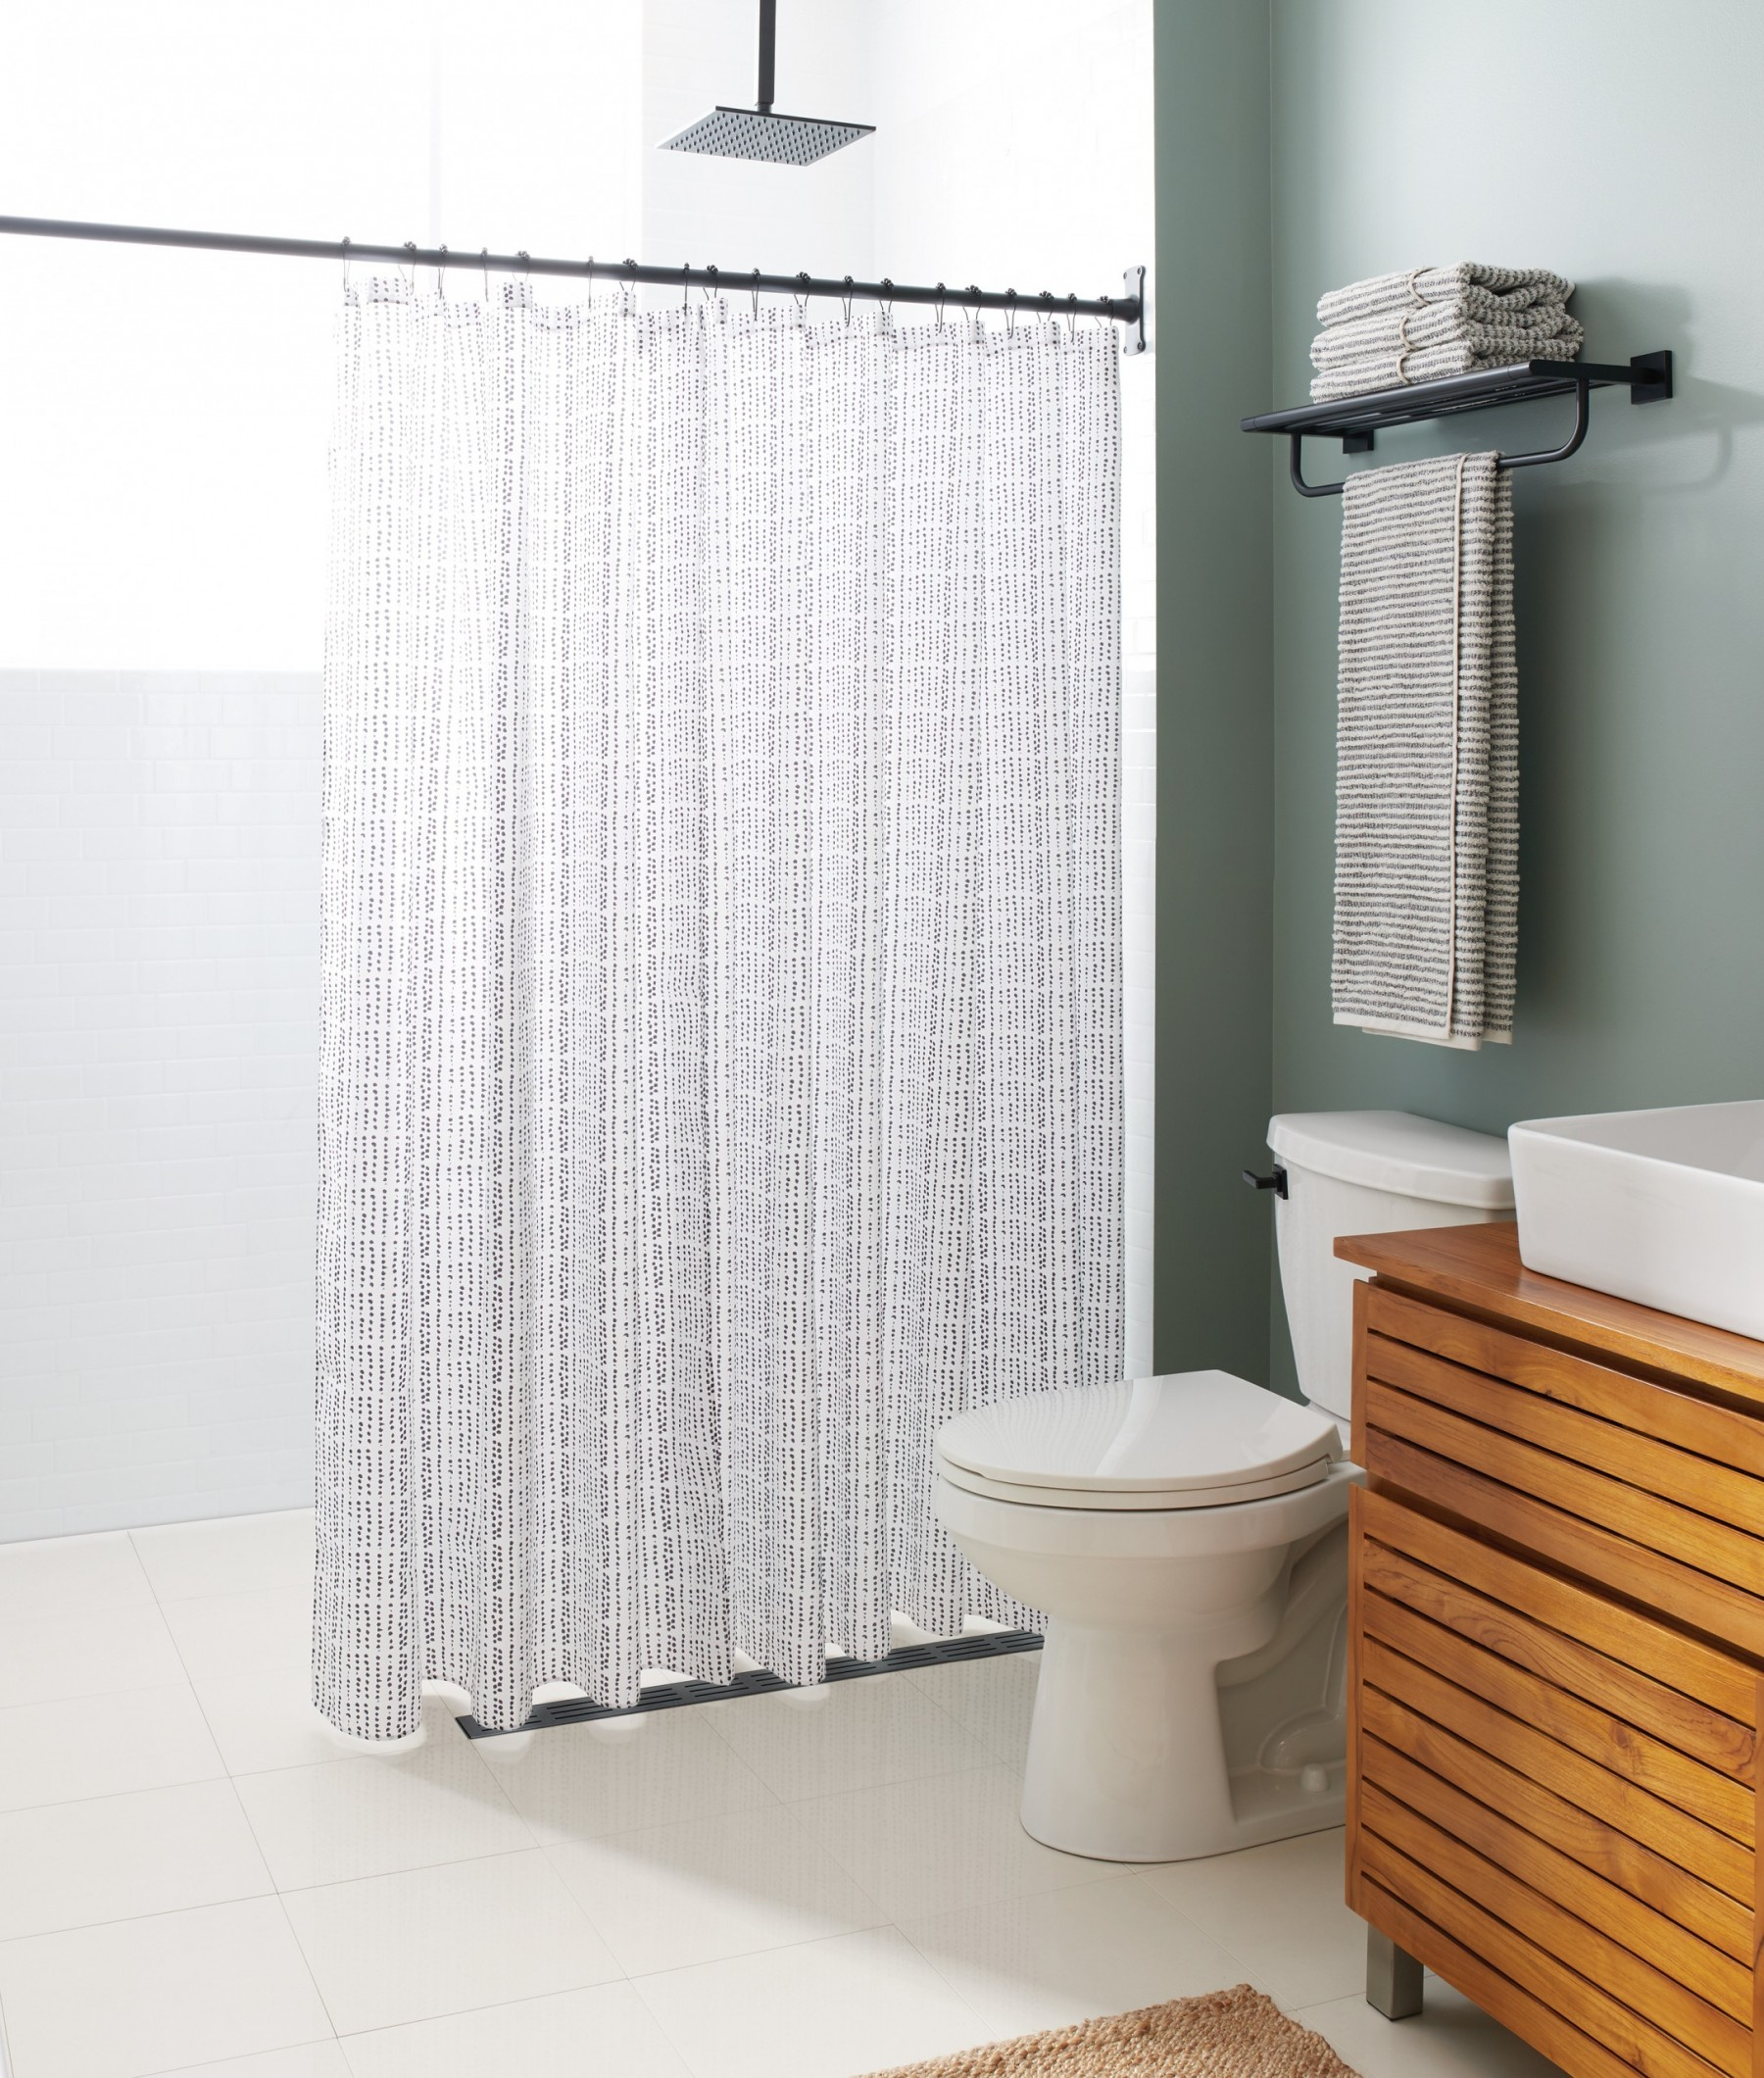 rain shower head in modern bathroom